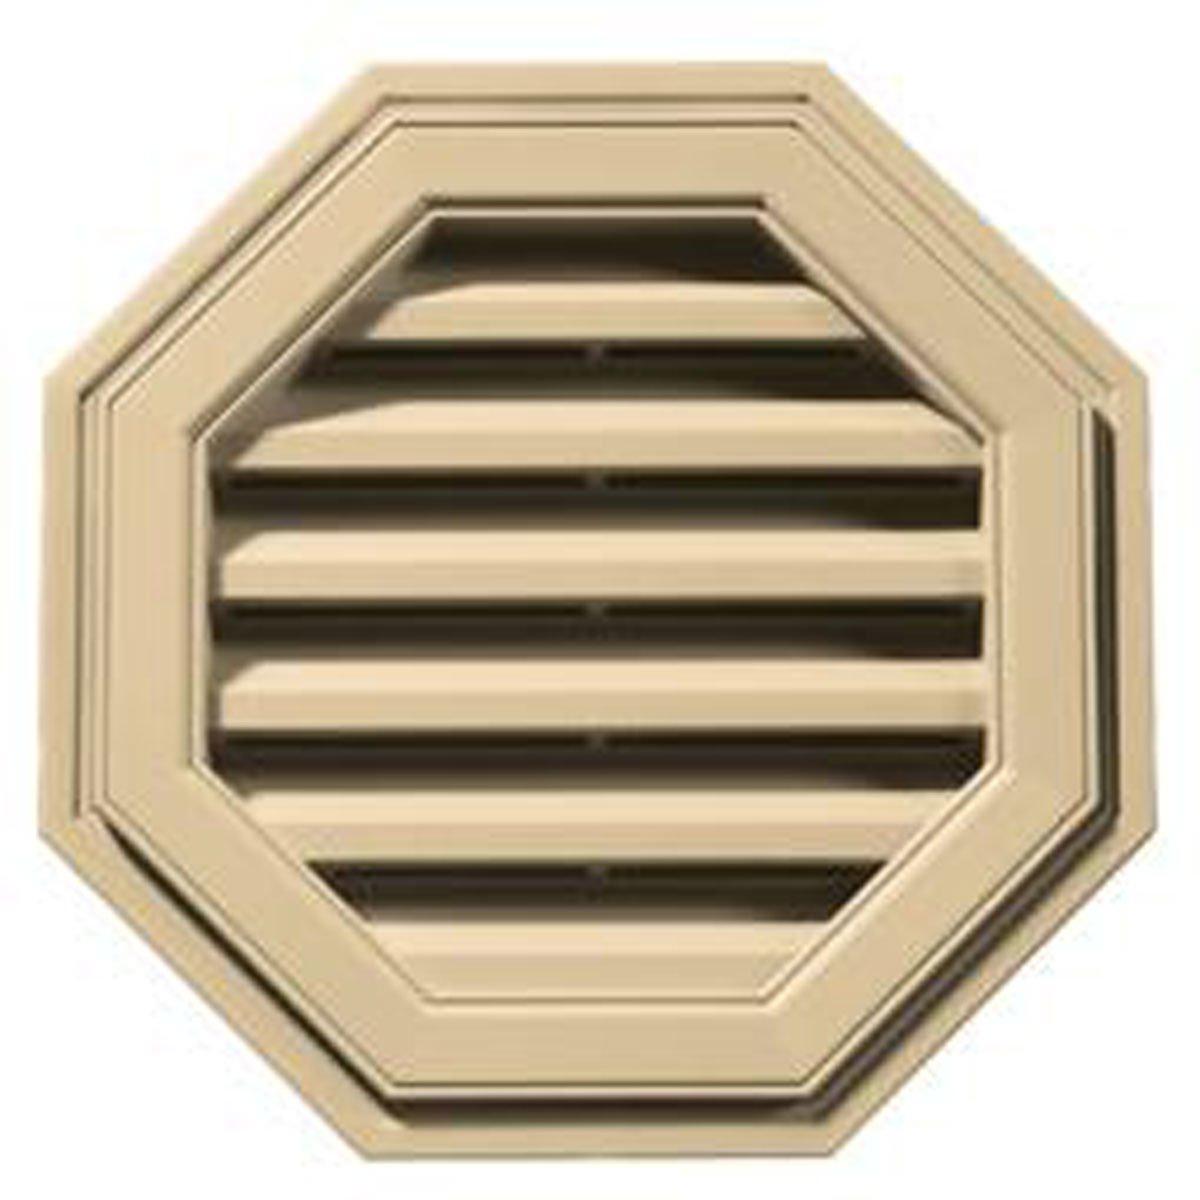 Sandstone Beige Builders Edge 120012222021 Vent